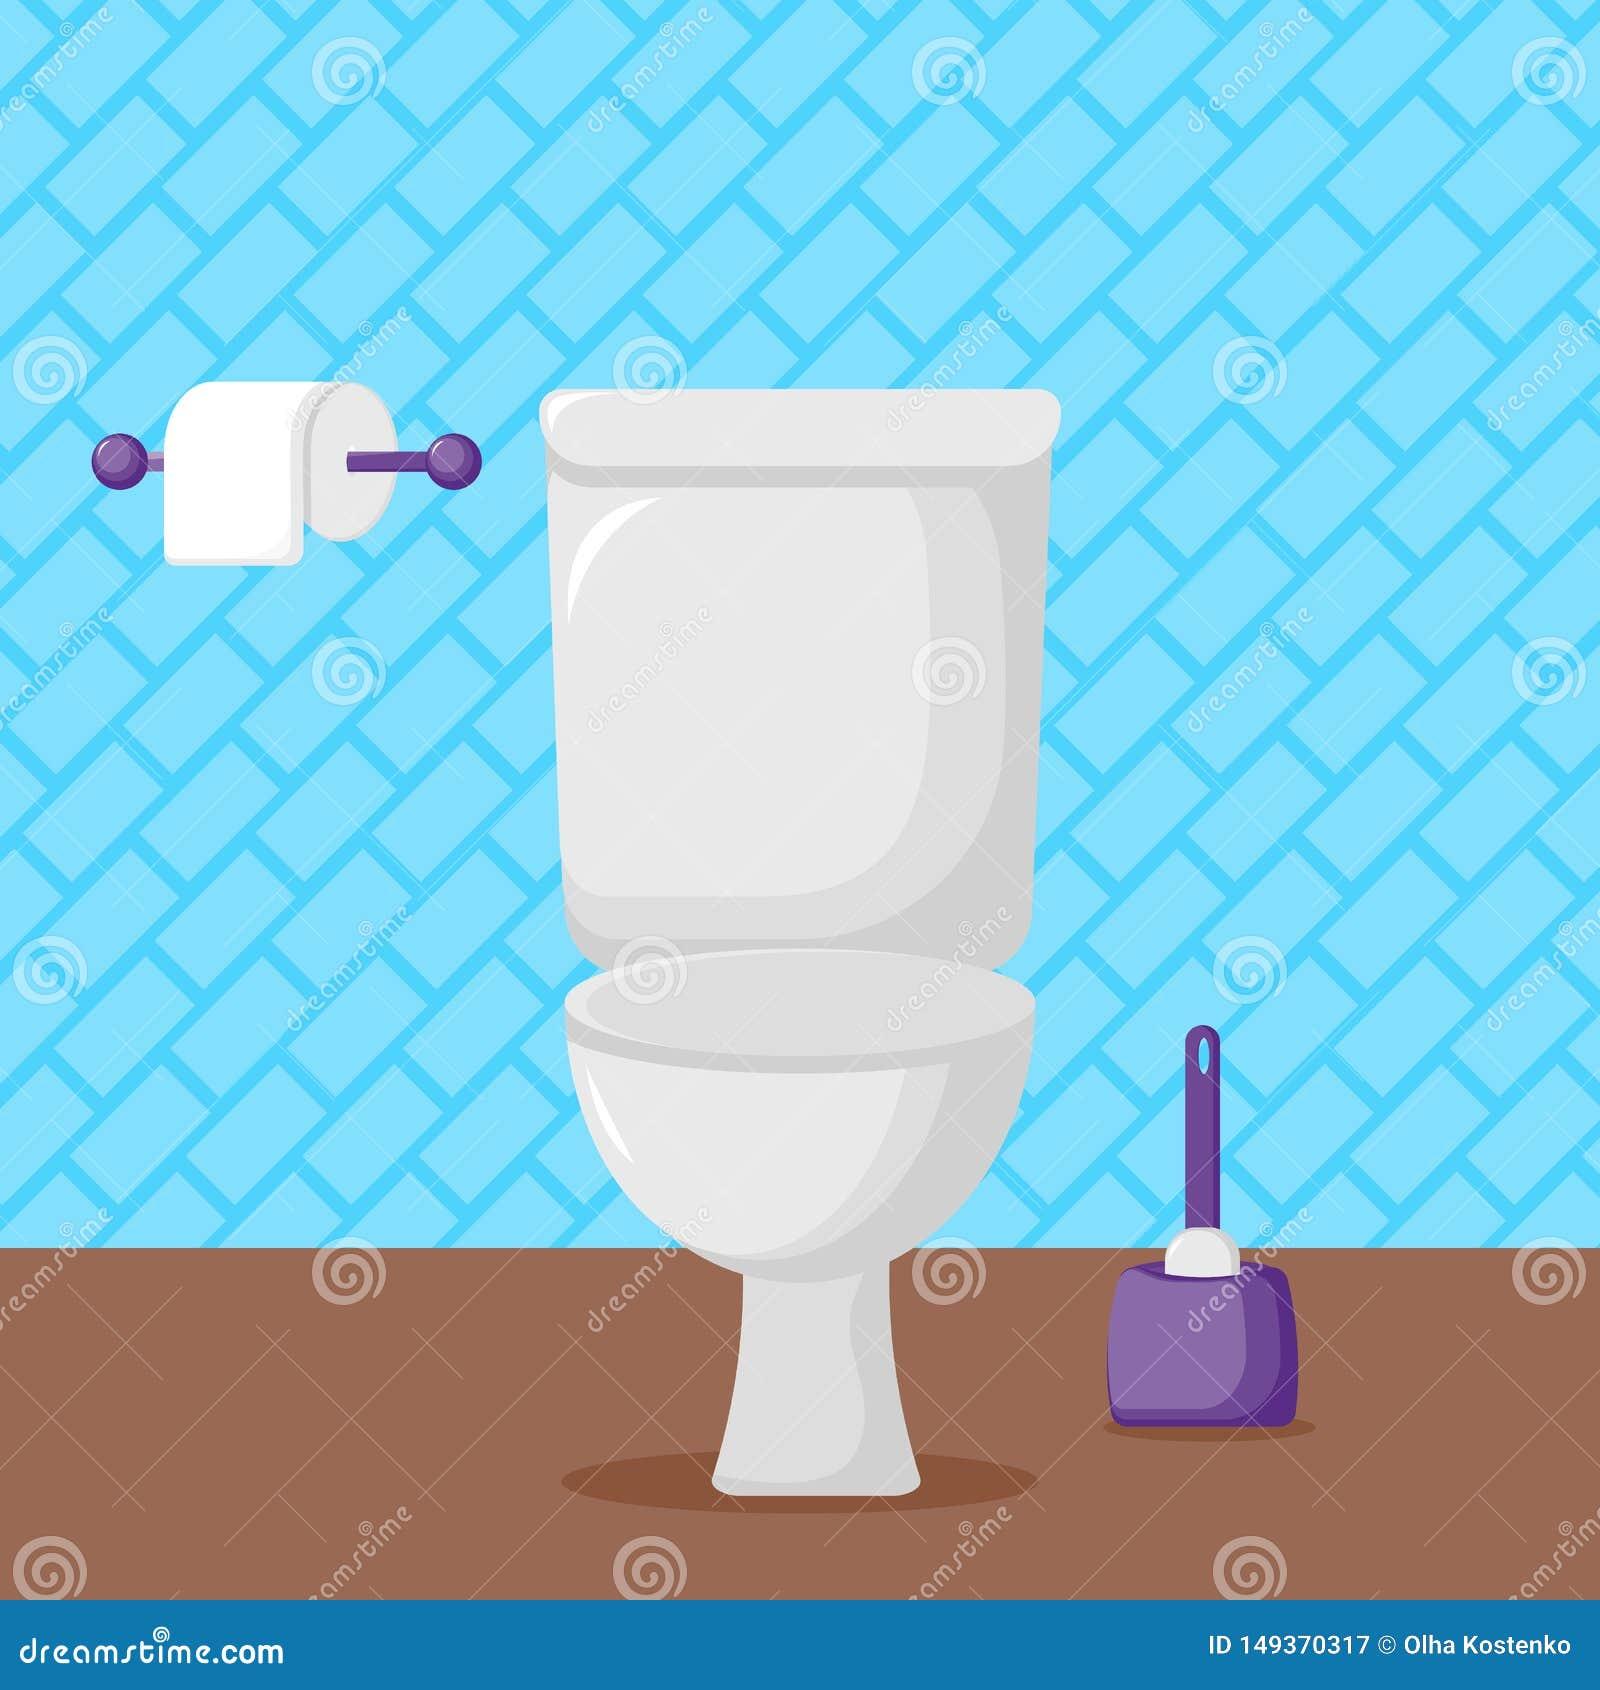 Biali ceramiki toaleta, papier toaletowy i mu?ni?cie,